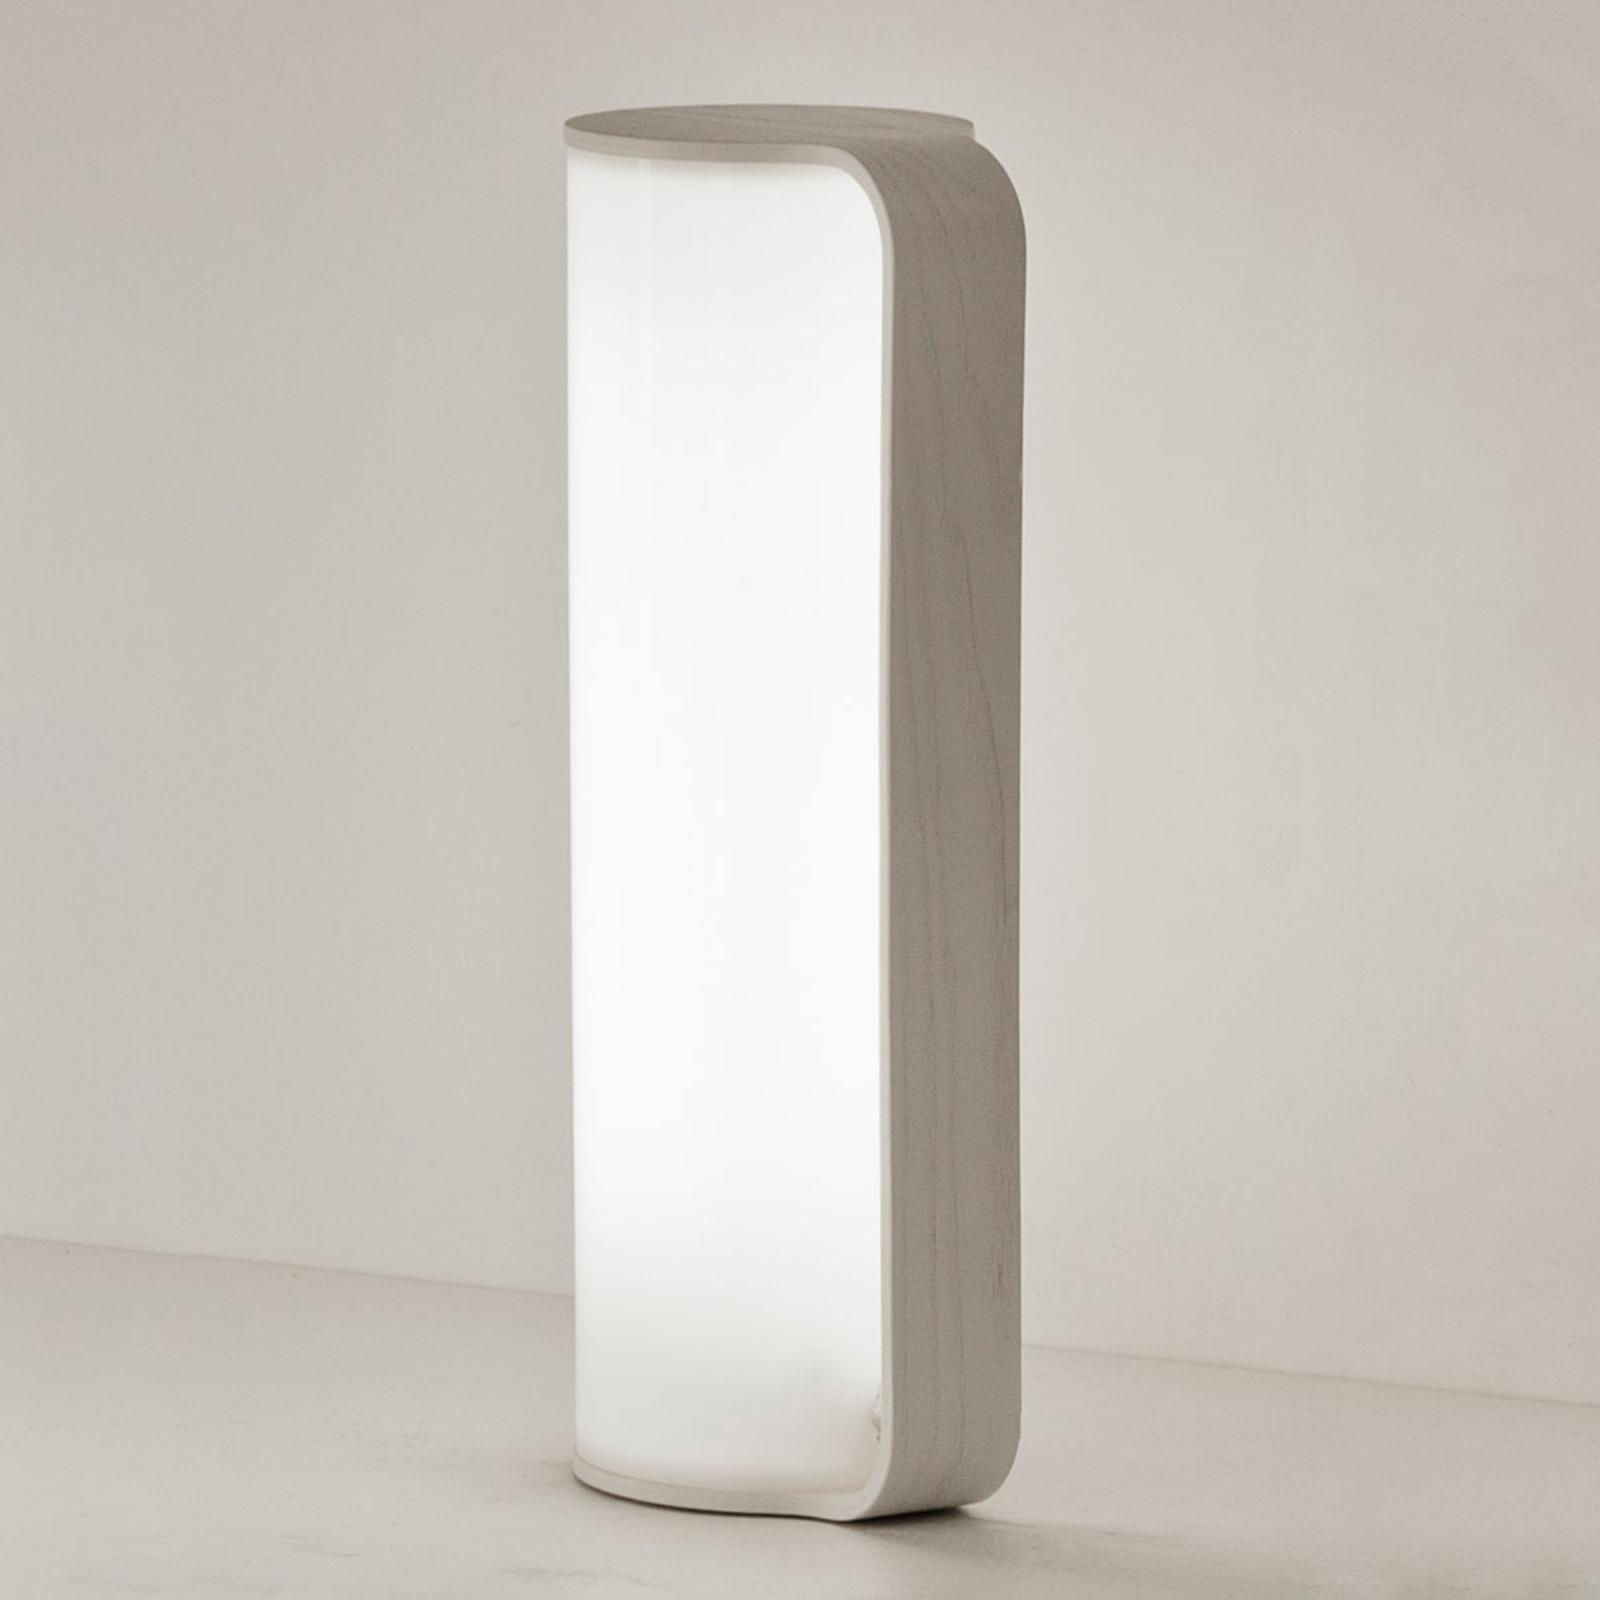 Innolux Tubo LED luce terapeutica, bianco, dimming